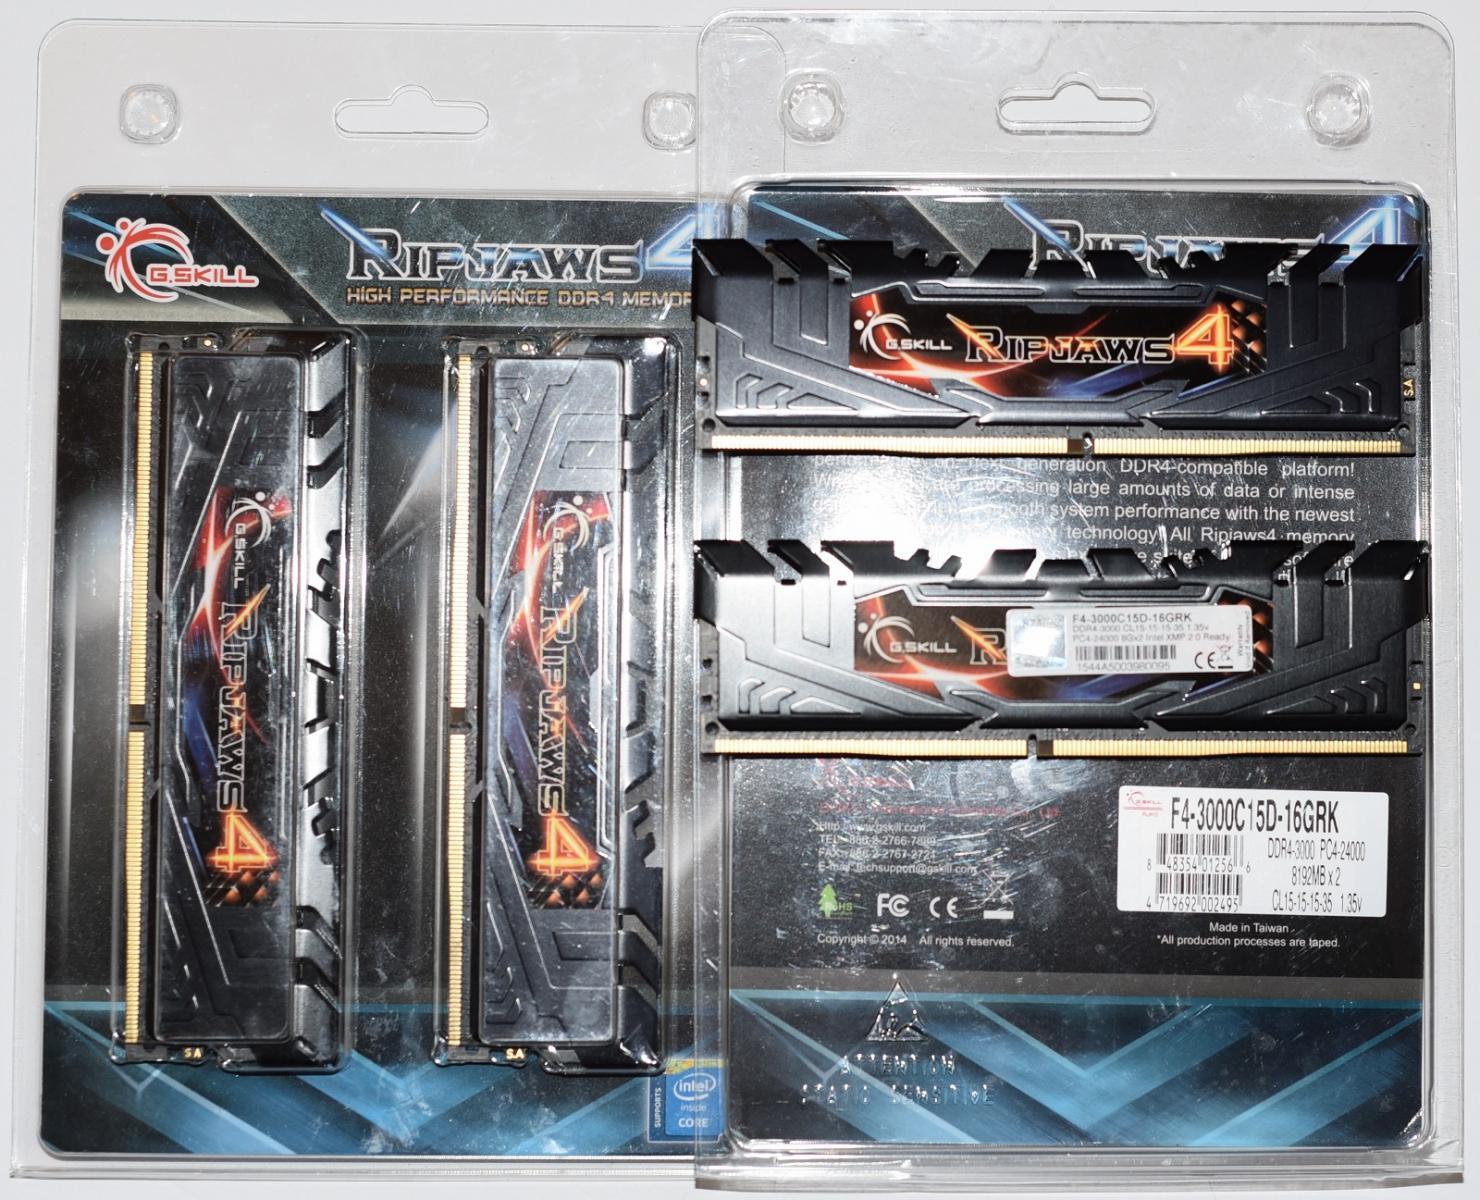 Photo of G.Skill 4x8GB Ripjaws 4 DDR4-3000 RAM